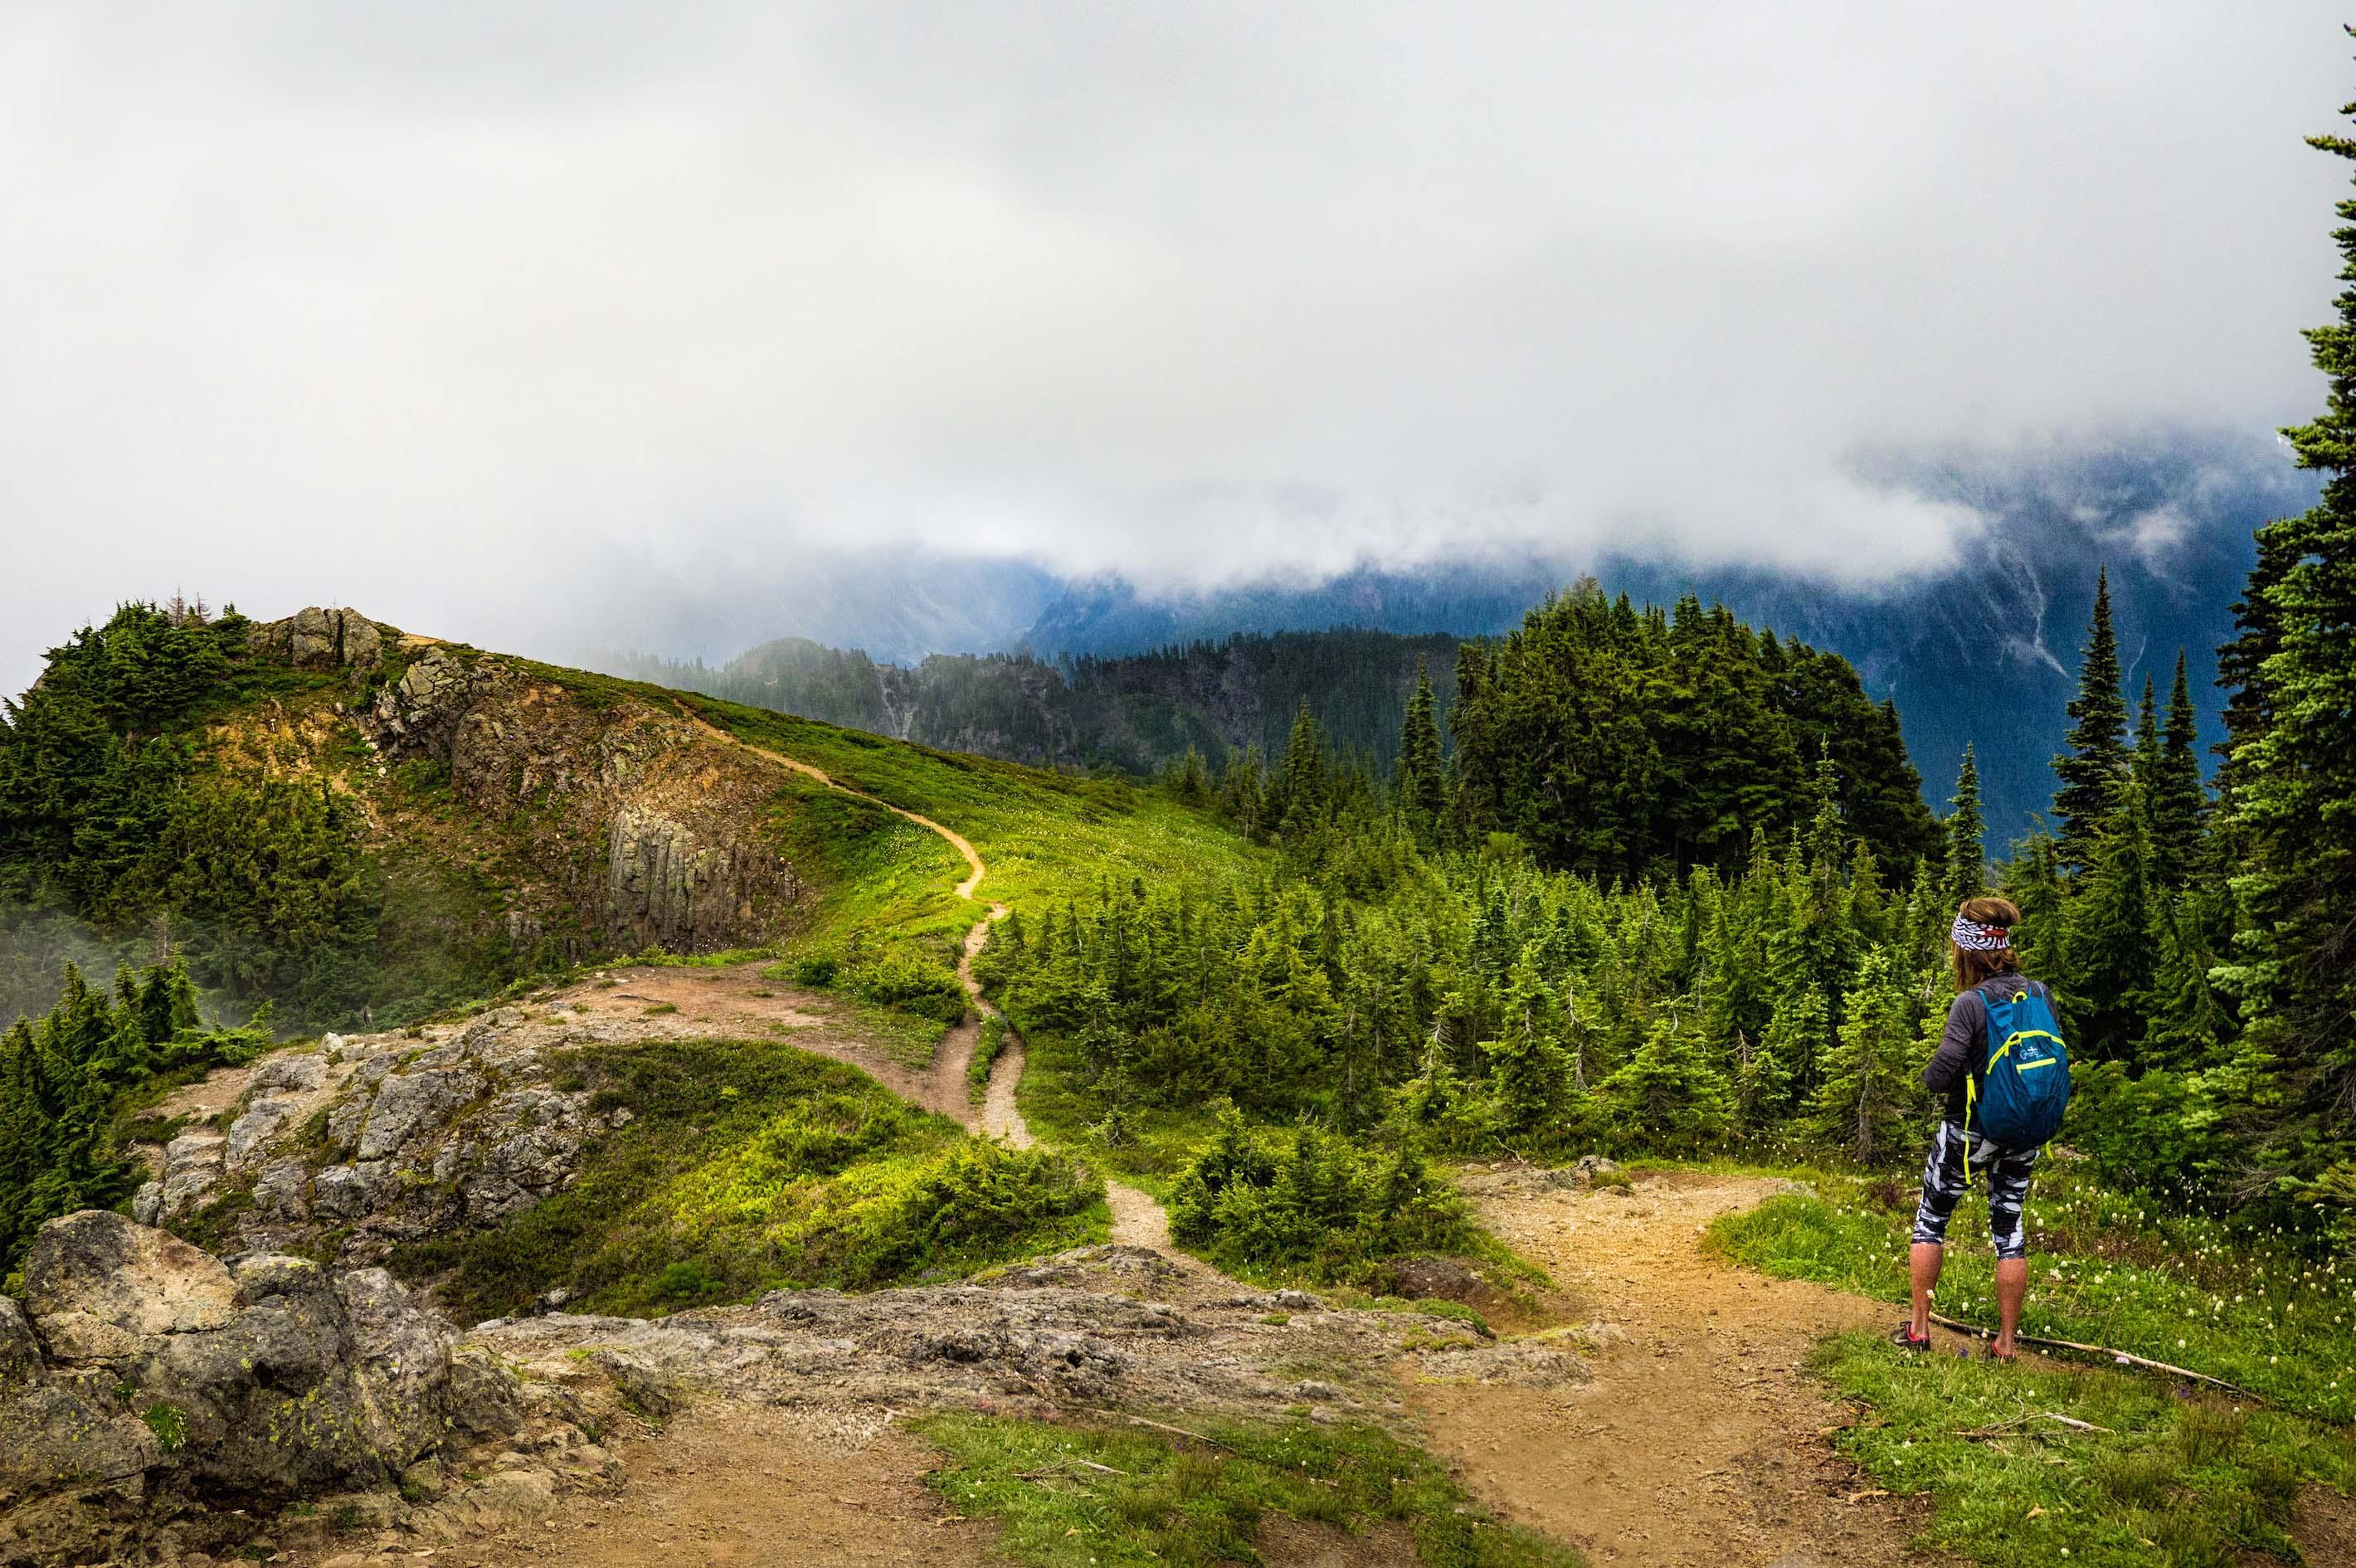 hikingguide1_Alex Donaghy.jpg